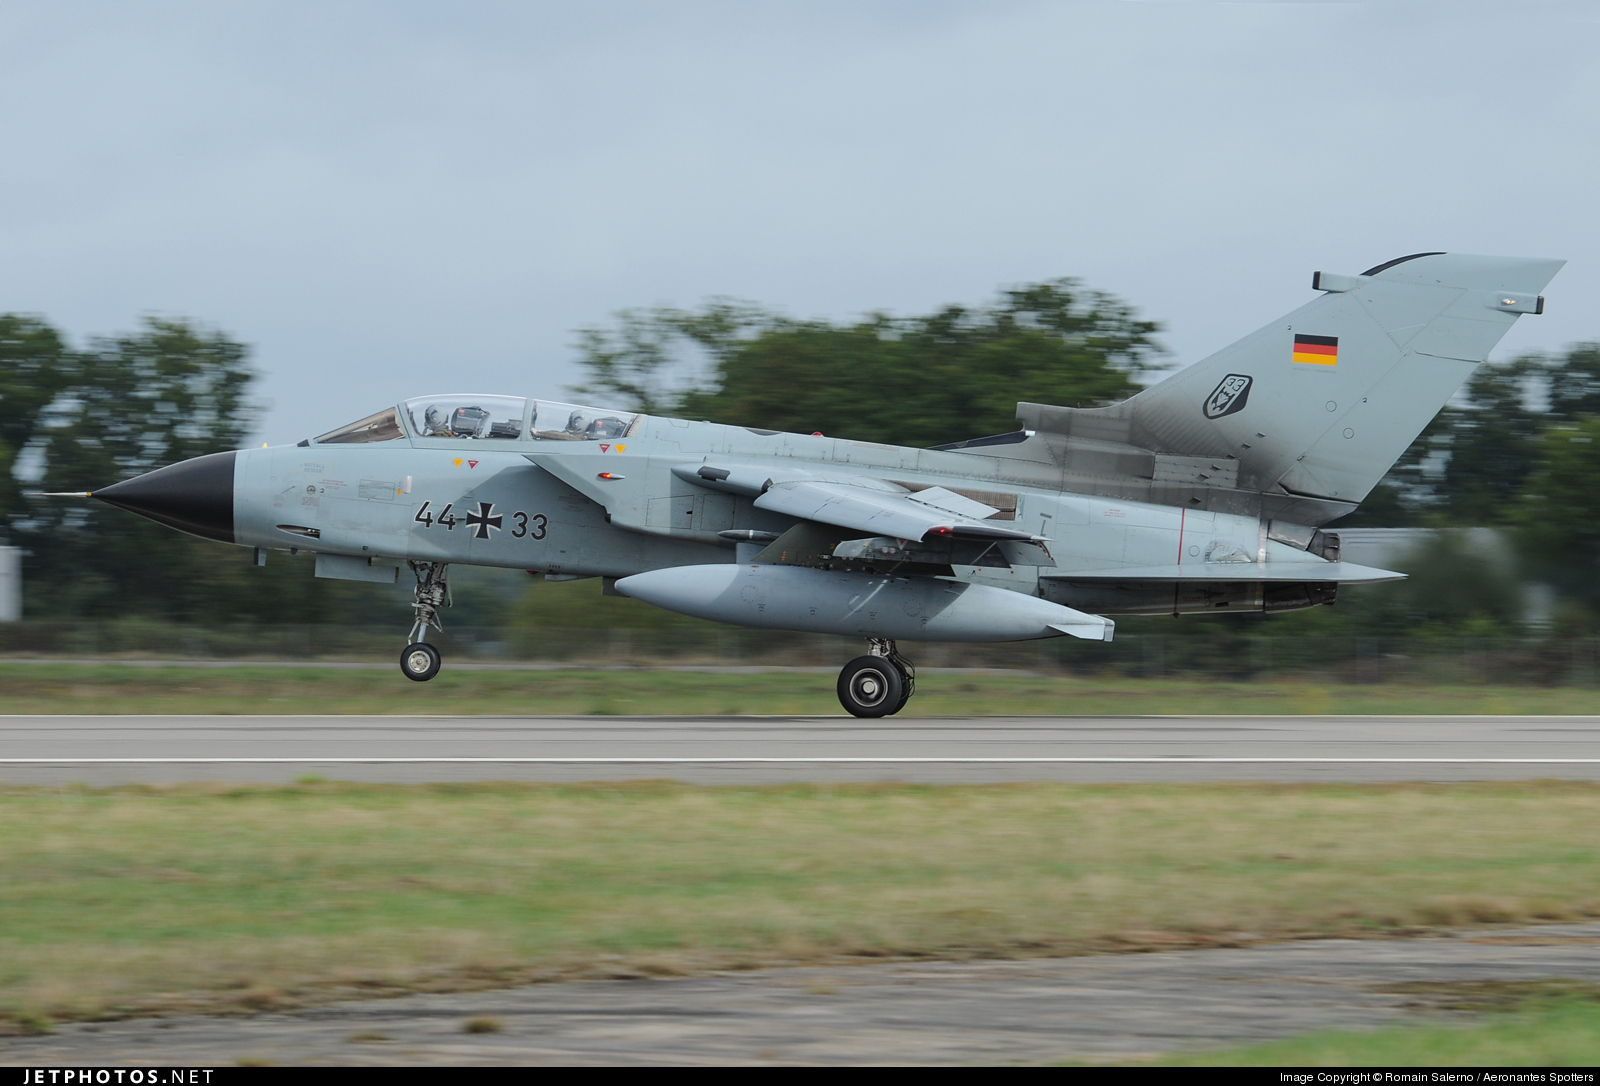 44-33 - Panavia Tornado - Germany - Air Force